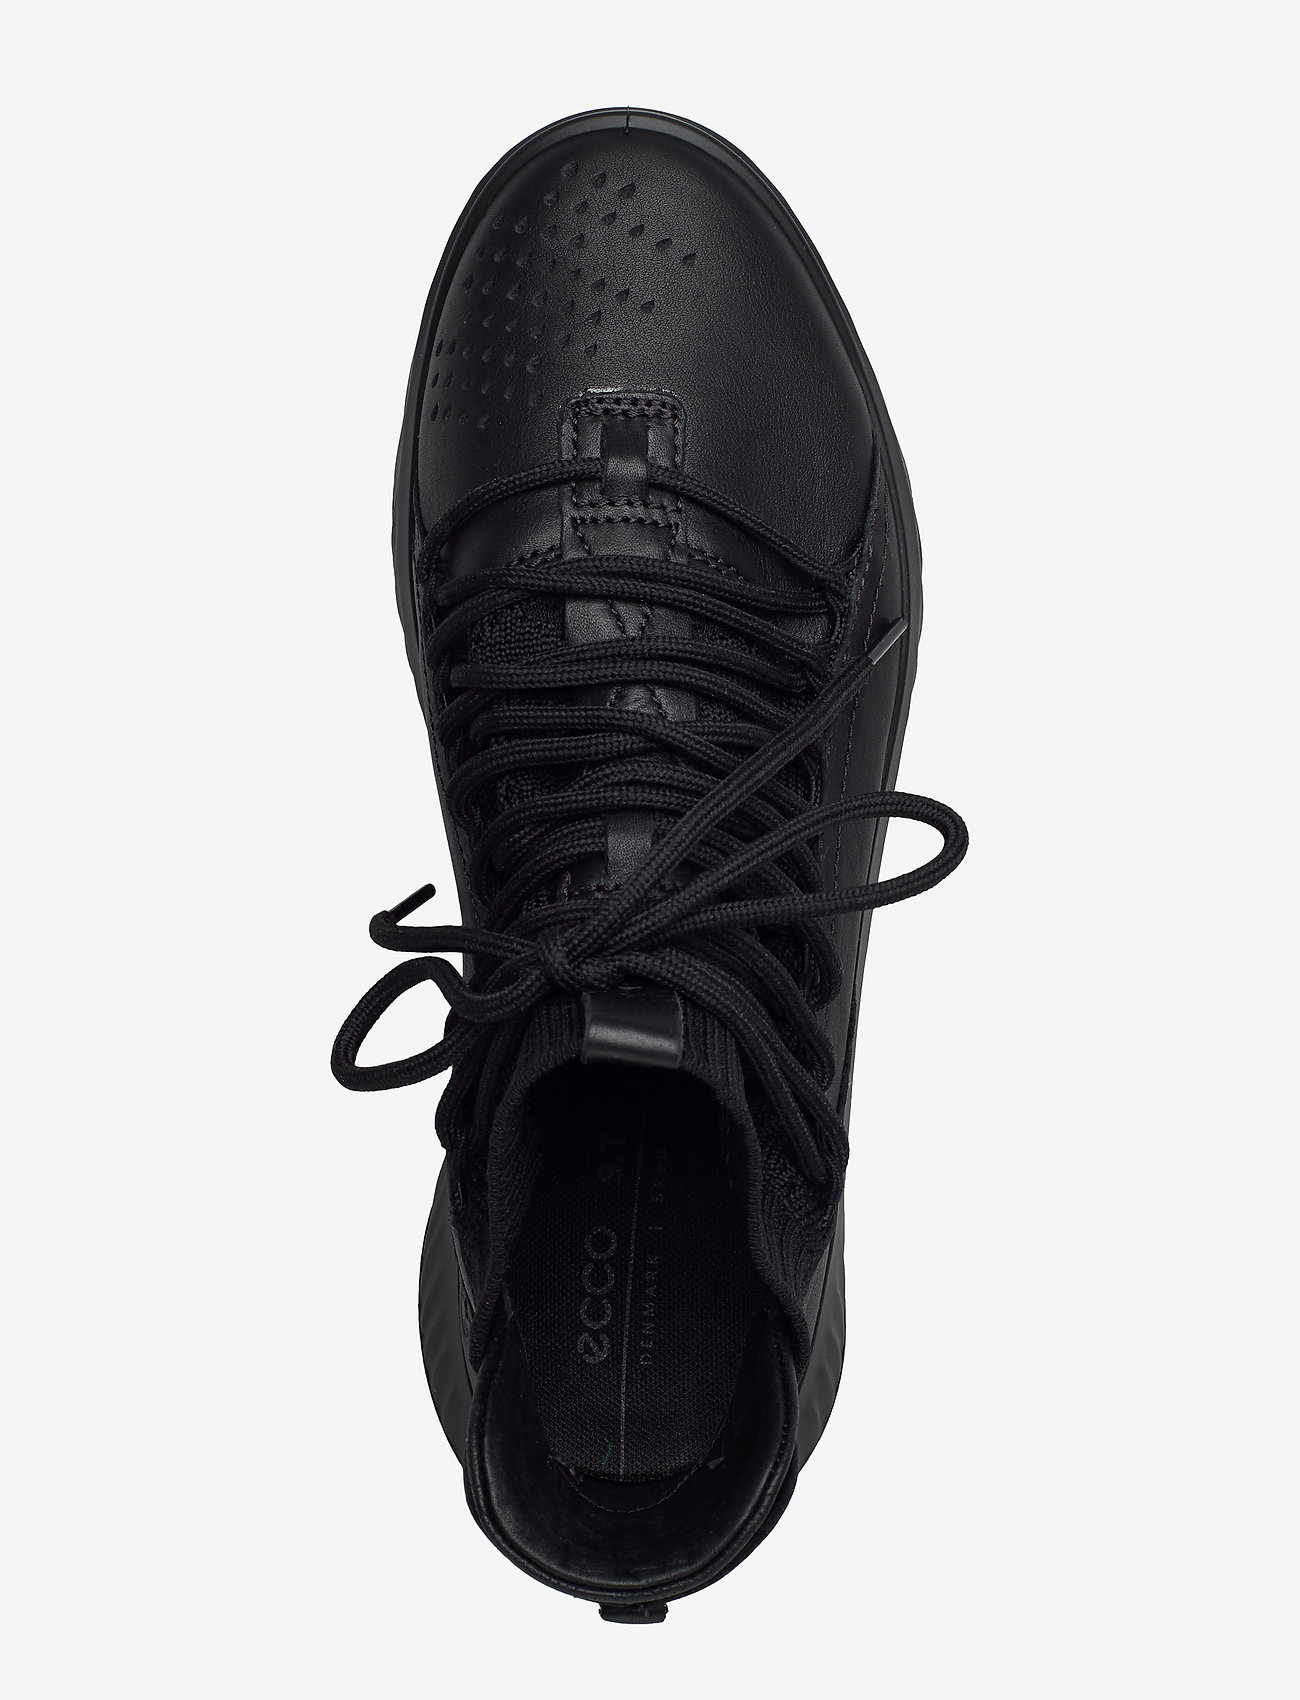 St.1 Lite W (Black/black) - ECCO